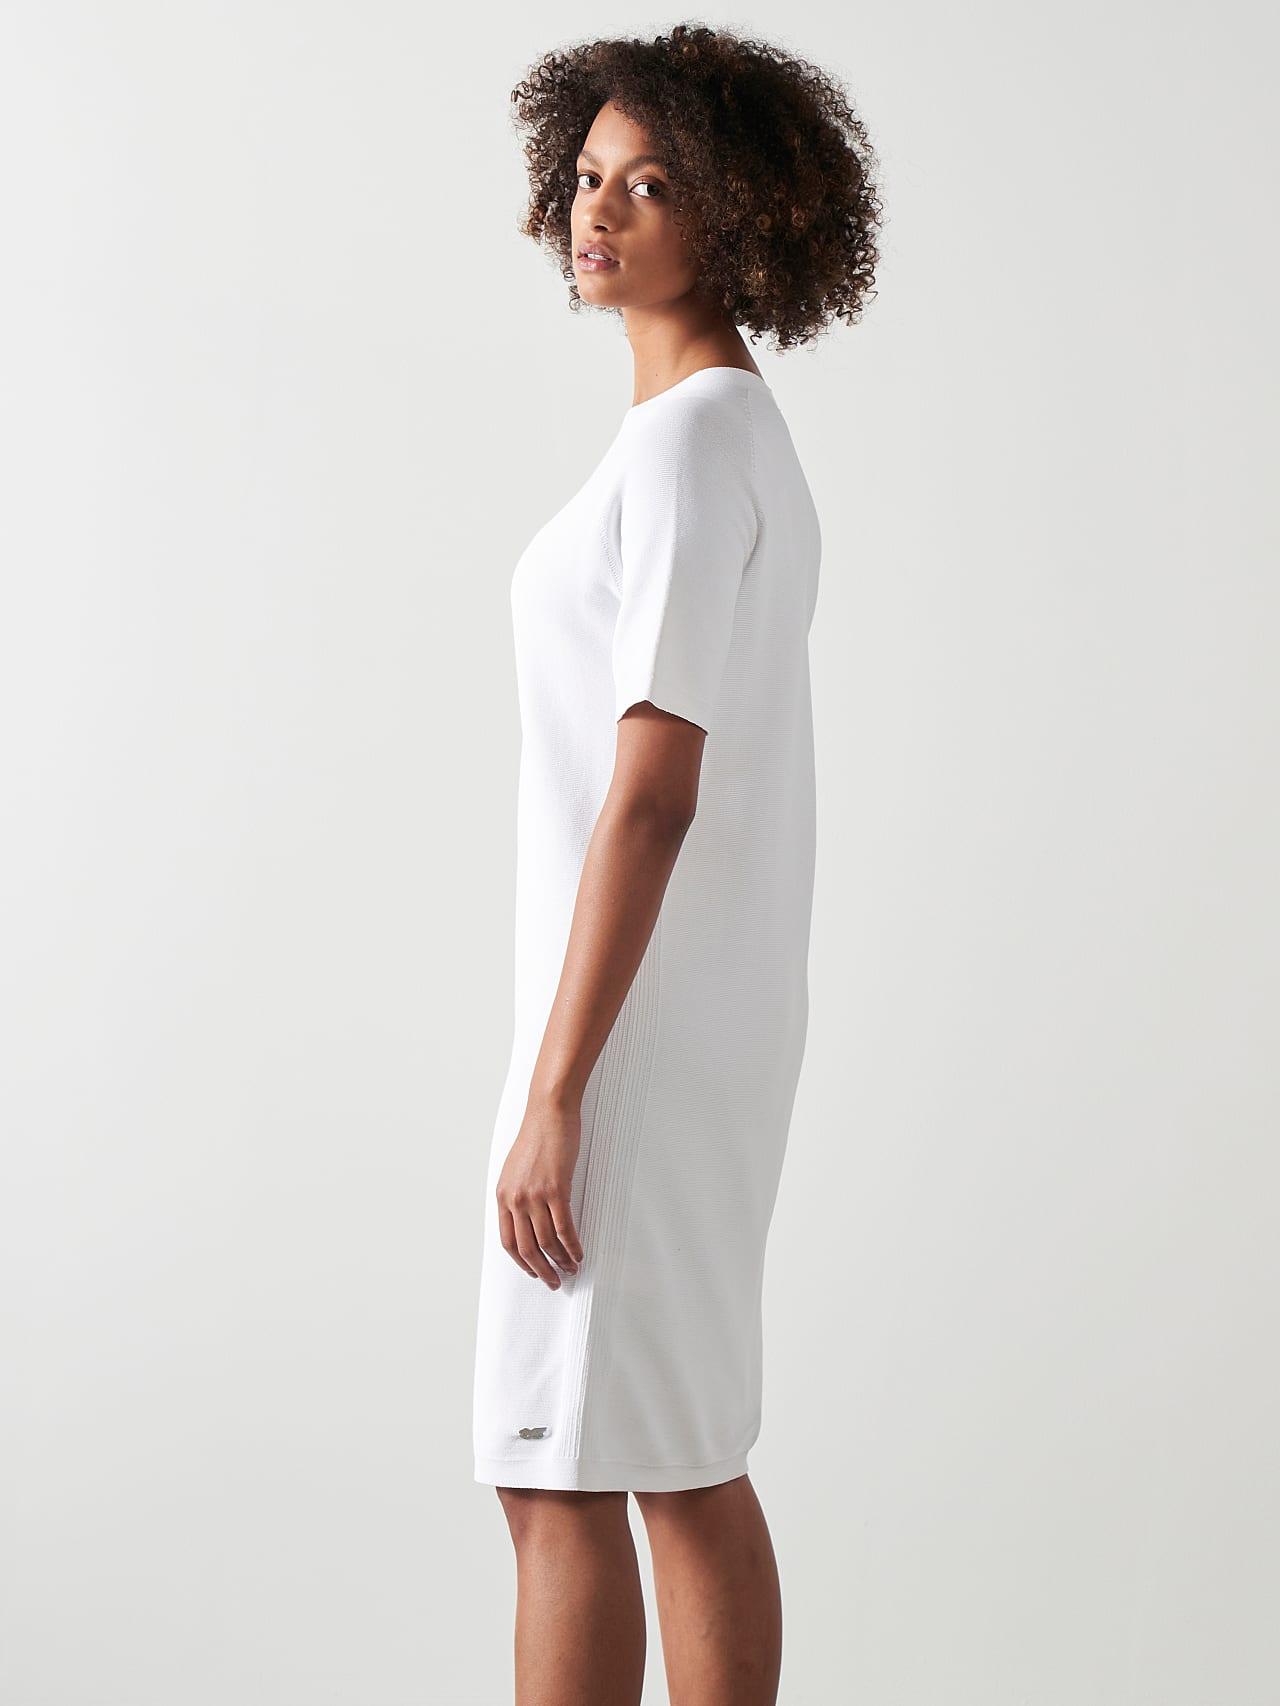 FZORF V1.Y5.01 Seamless Knit Dress white Front Alpha Tauri